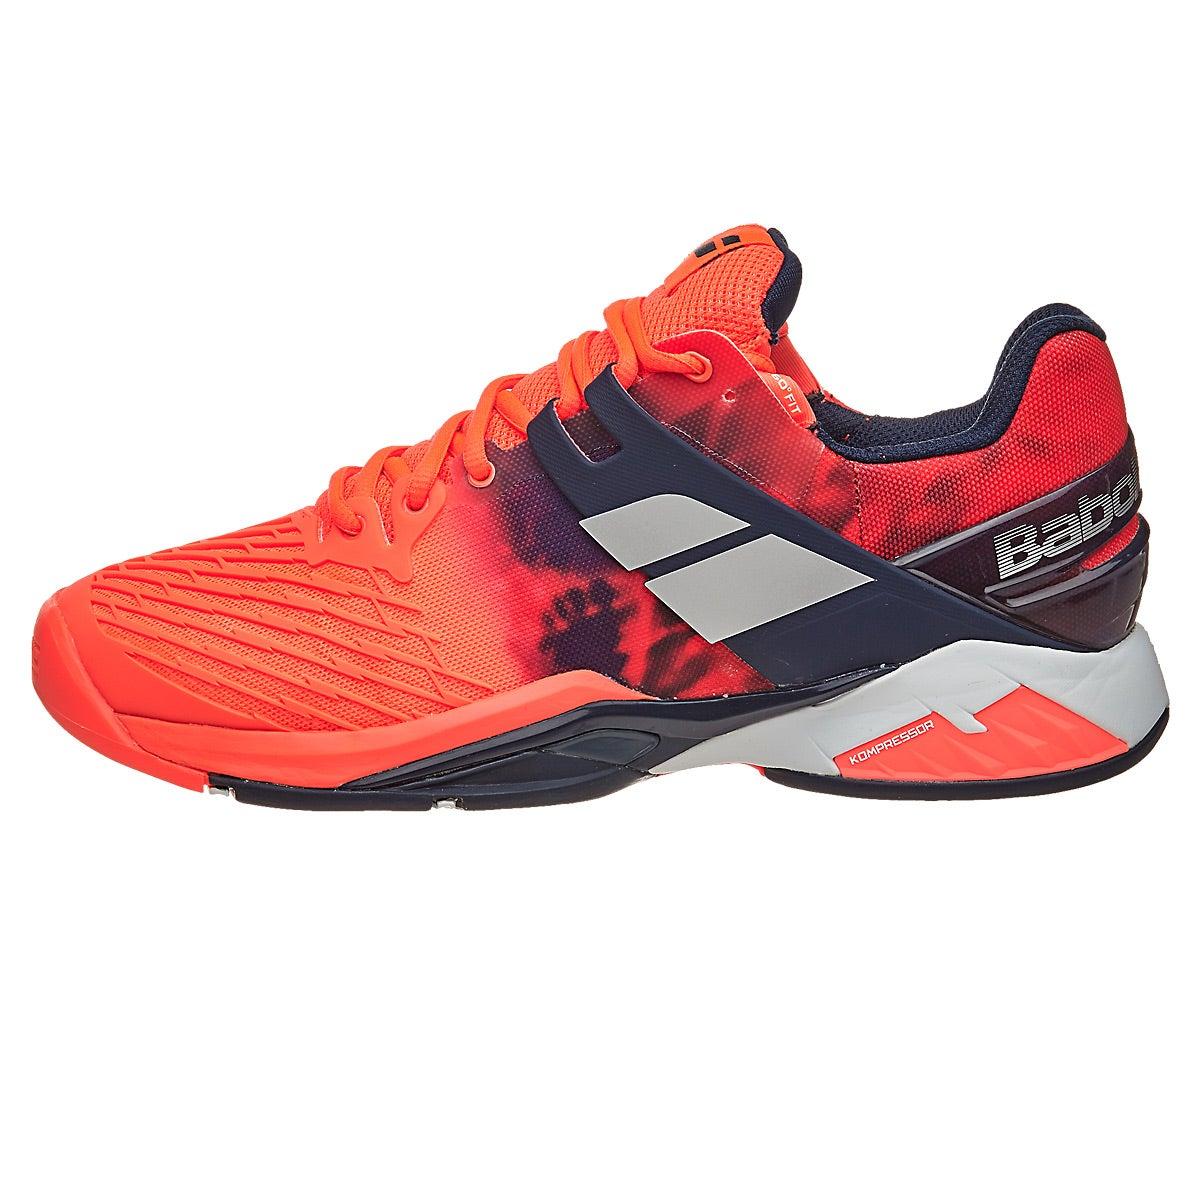 Babolat Propulse Fury Fluro Red Men S Shoes